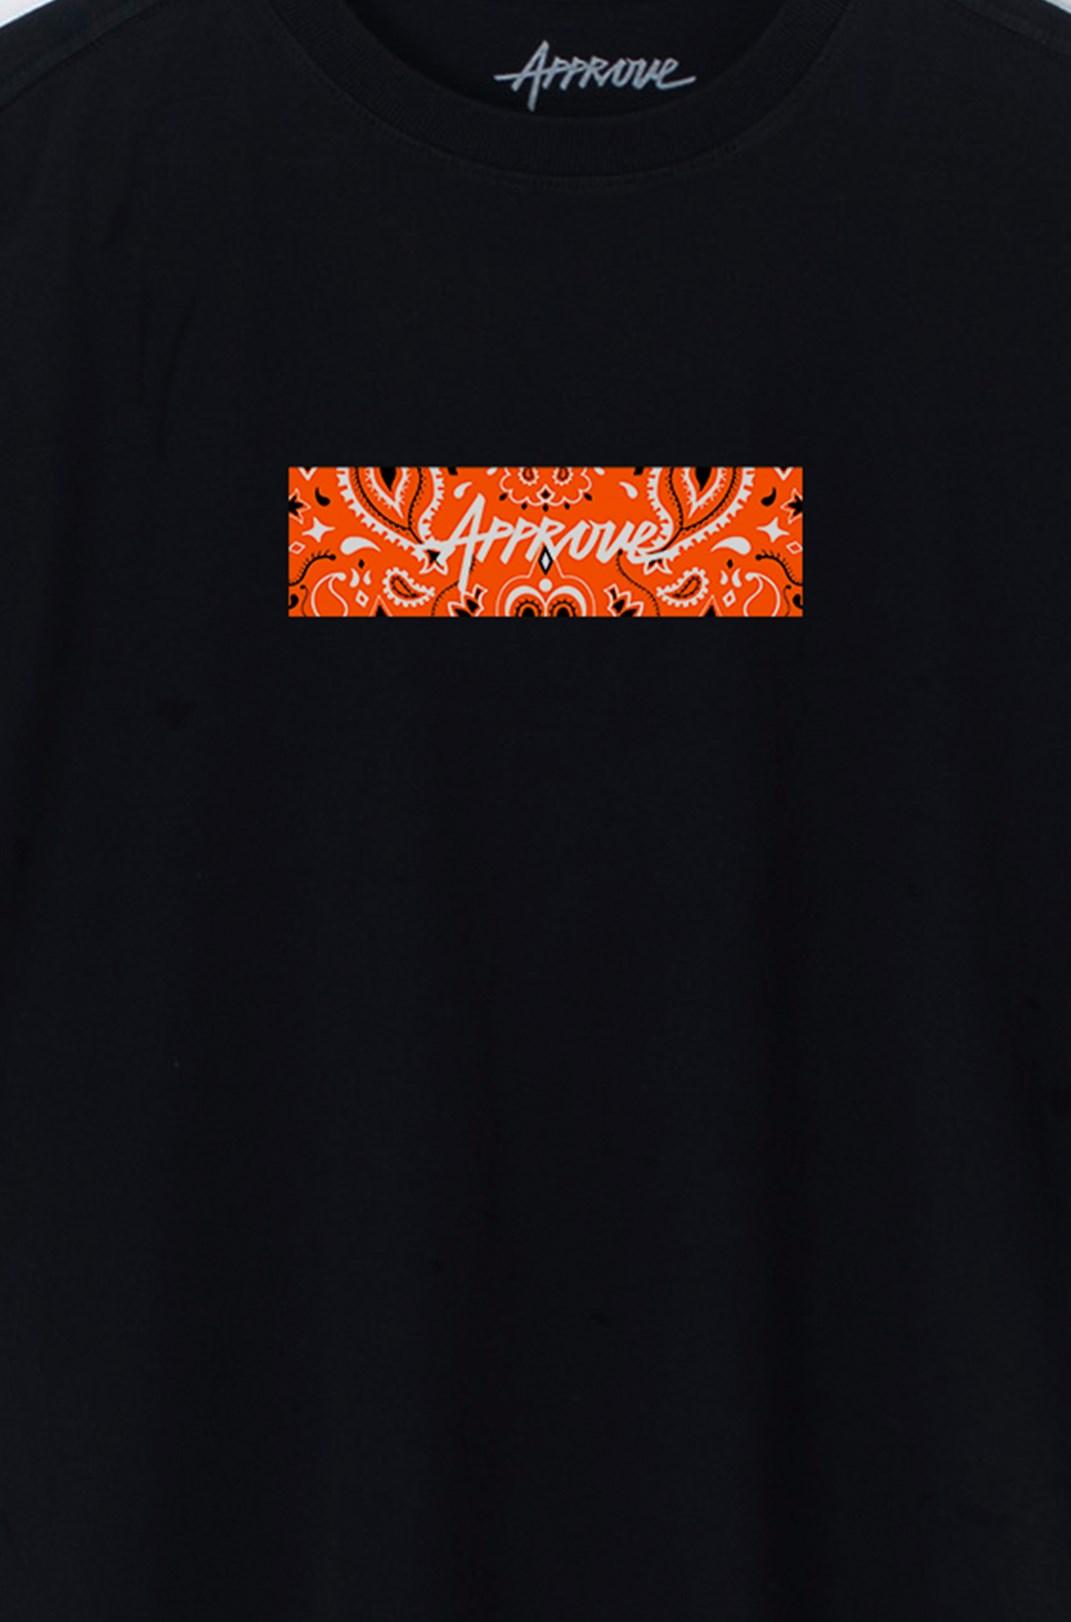 Camiseta Bold Approve Cashmere Preta E Laranja